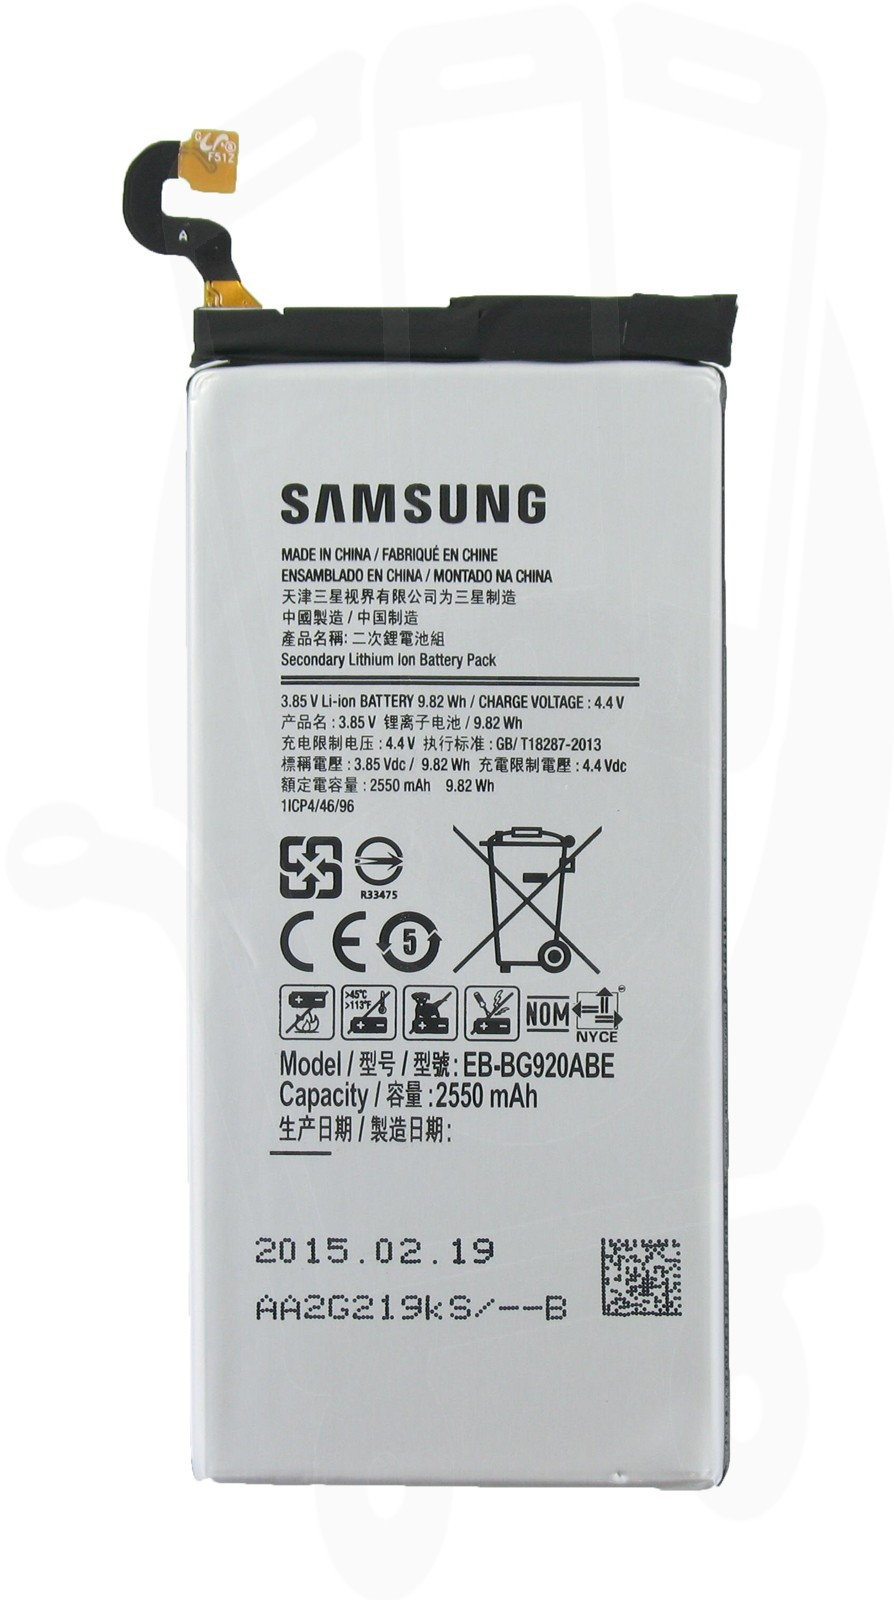 Samsung EB-BG920ABE